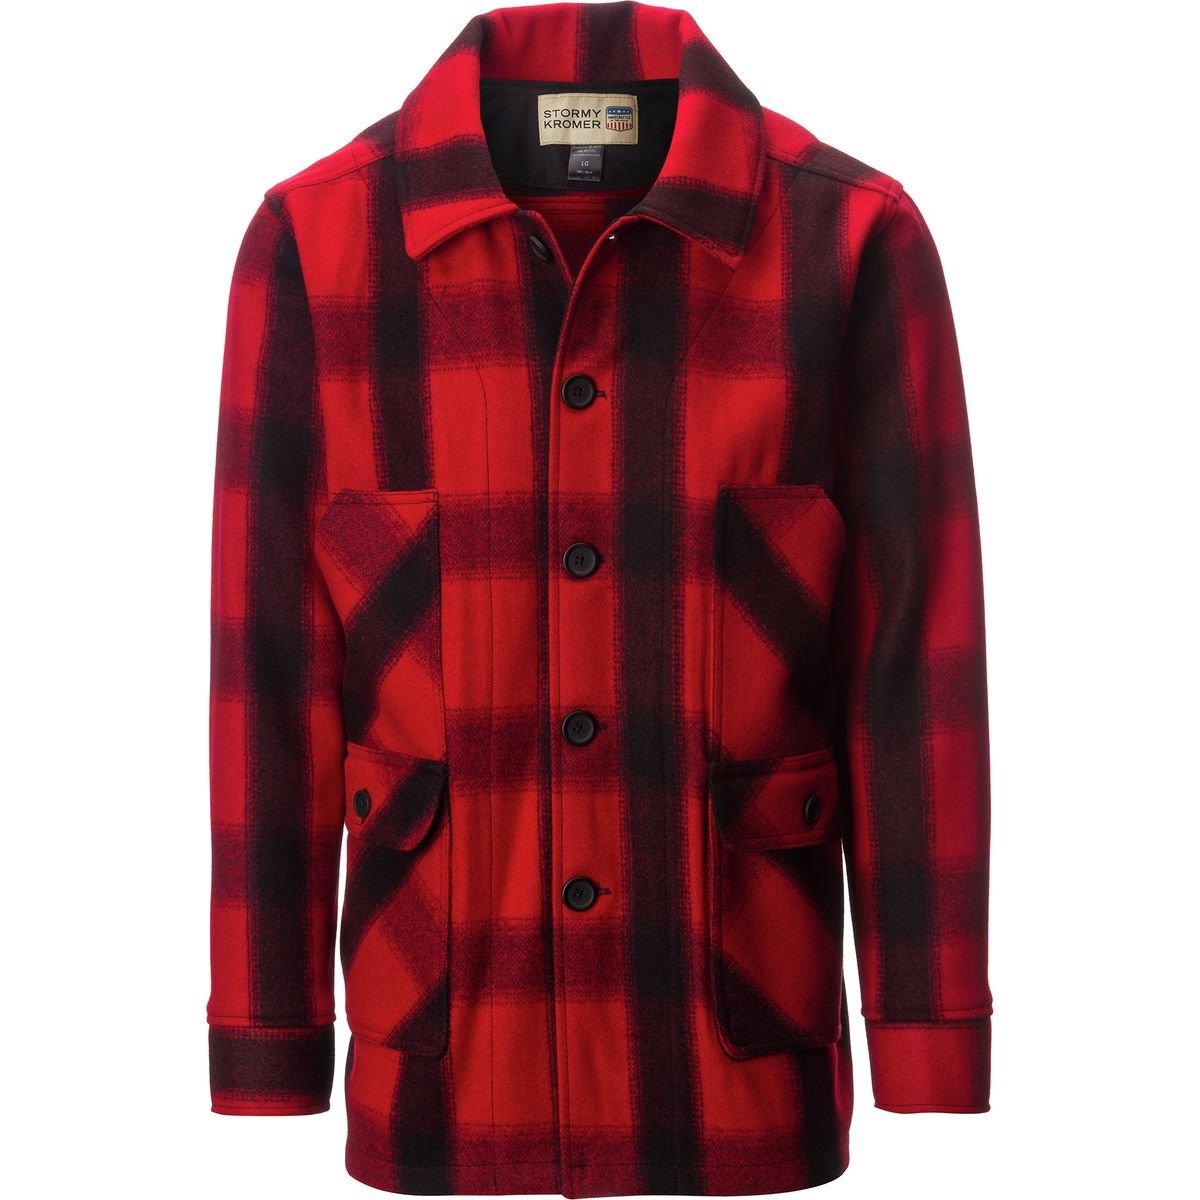 Stormy Kromer Mercantile mackinaw Coat - Men's Red/Black Plaid, L